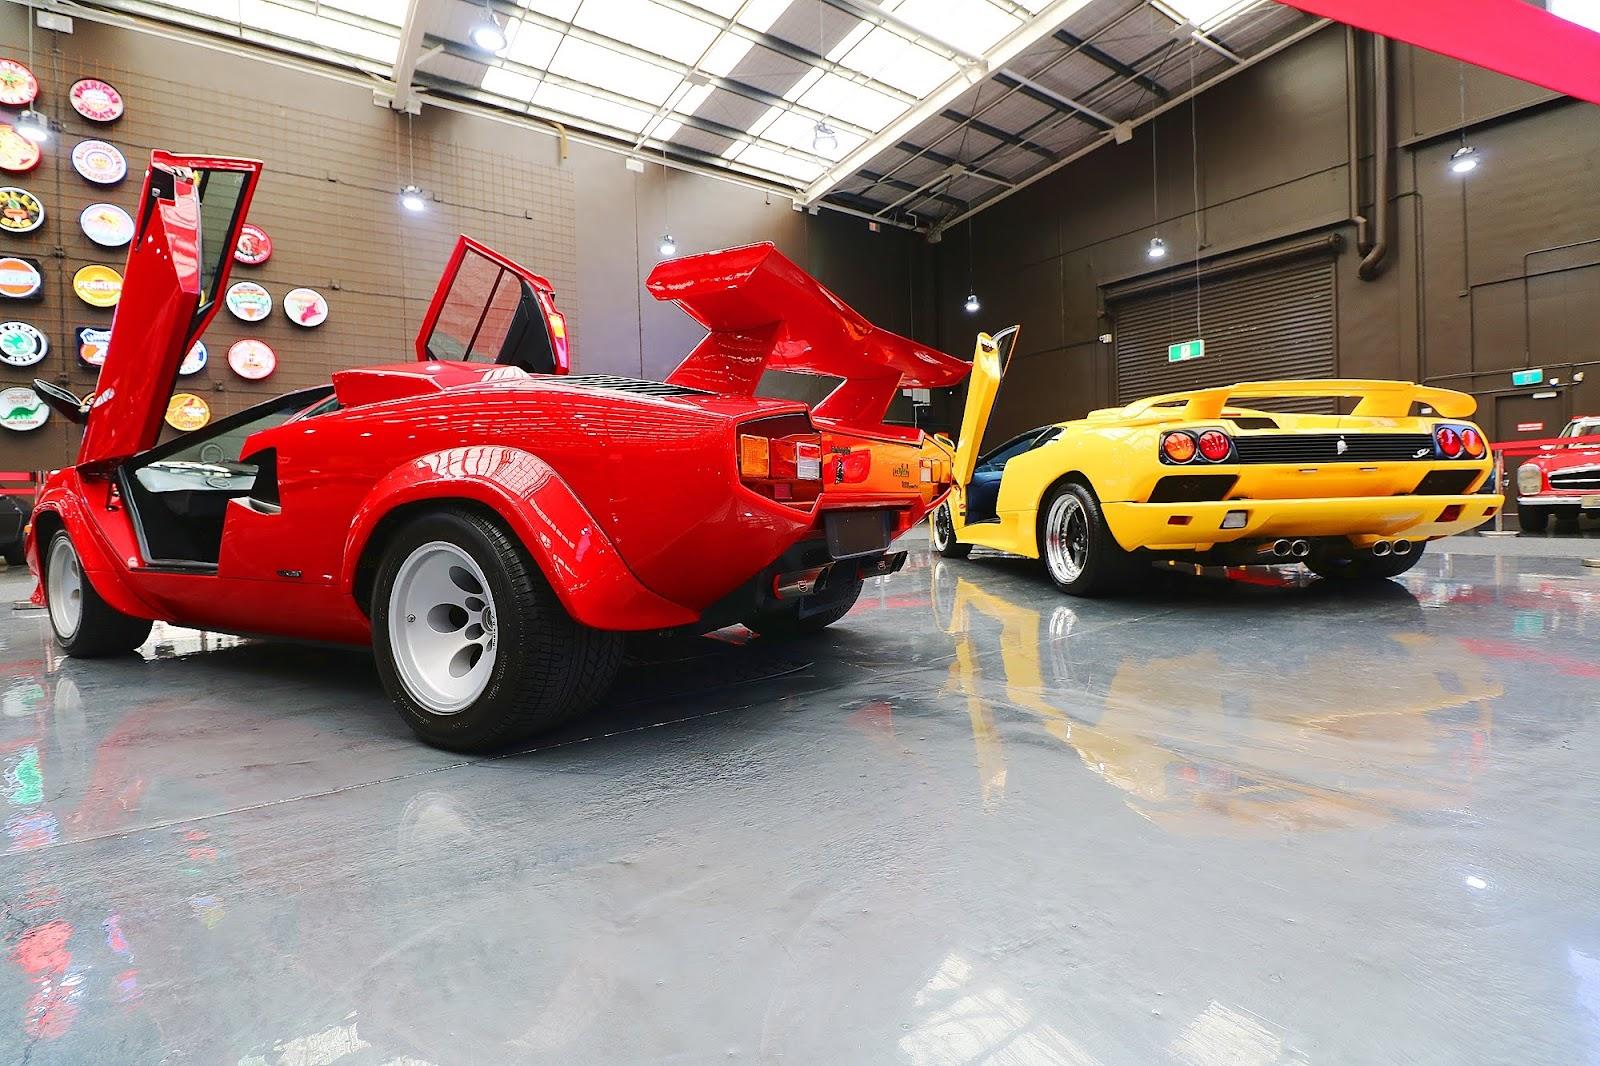 Lamborghinis - Countach and Diablo SV (02).jpg